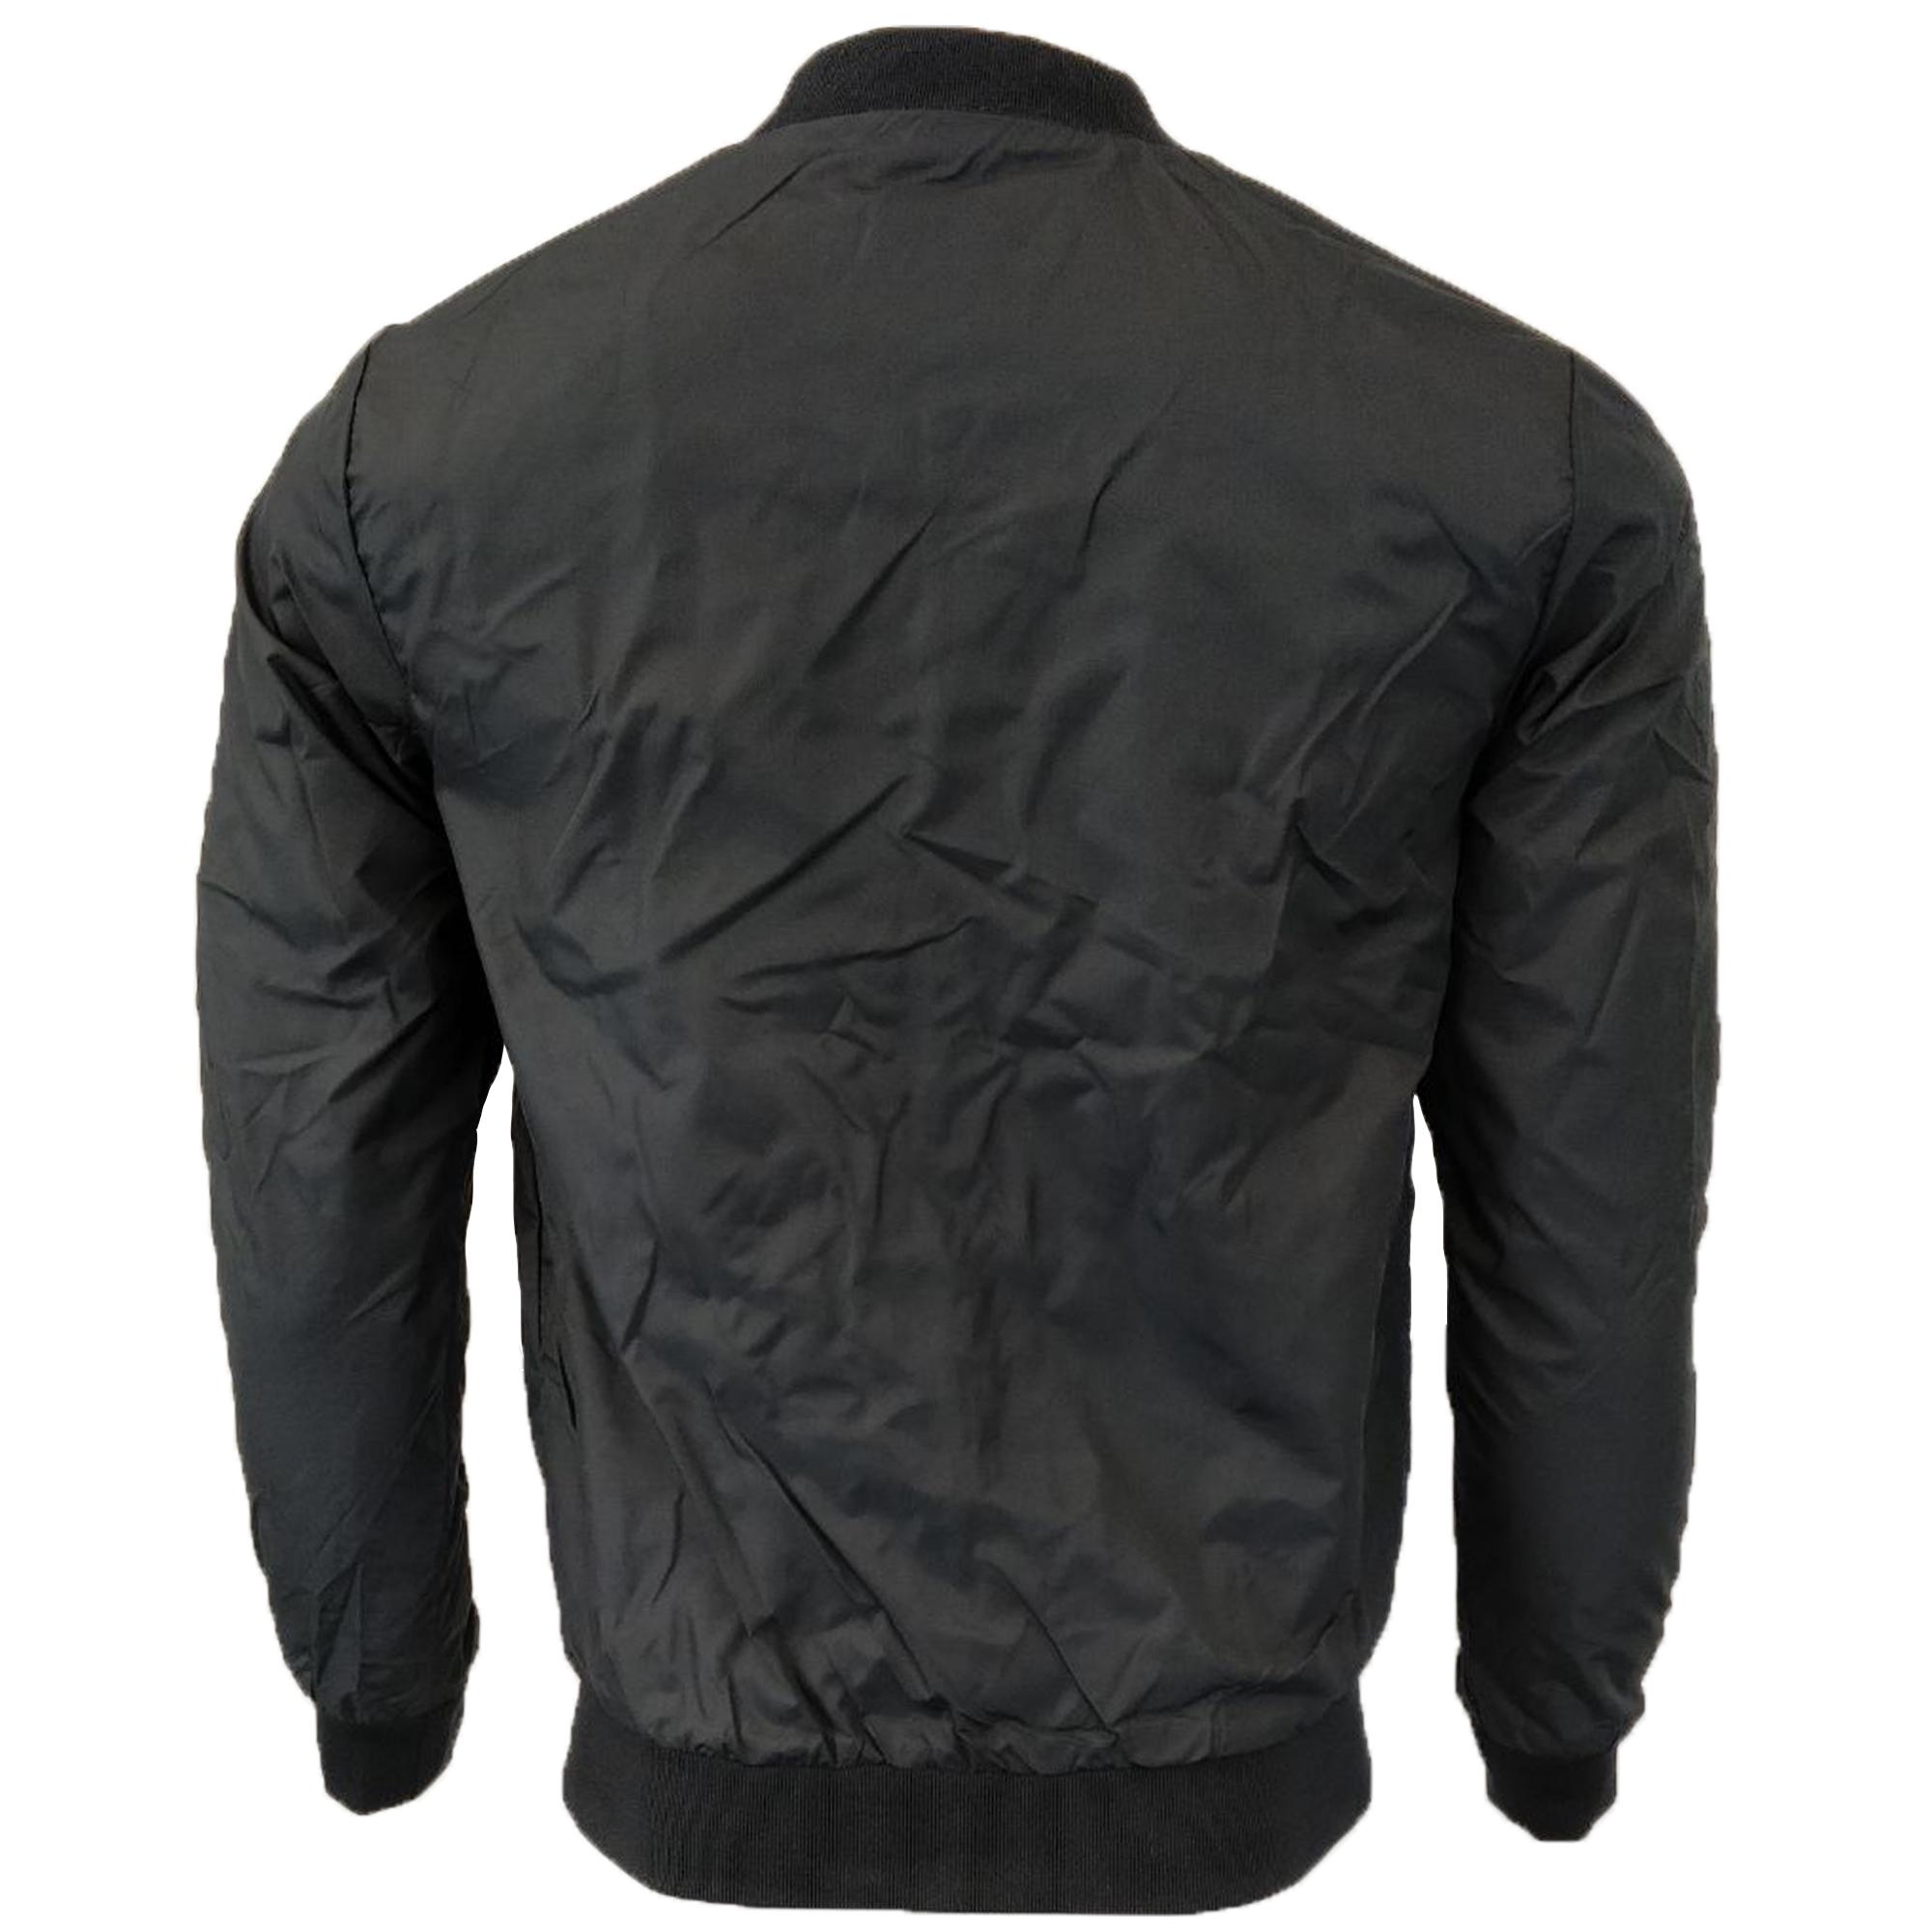 Mens-Jacket-Brave-Soul-Coat-Bomber-Baseball-Marvin-Lightweight-Hinckly-Summer thumbnail 6